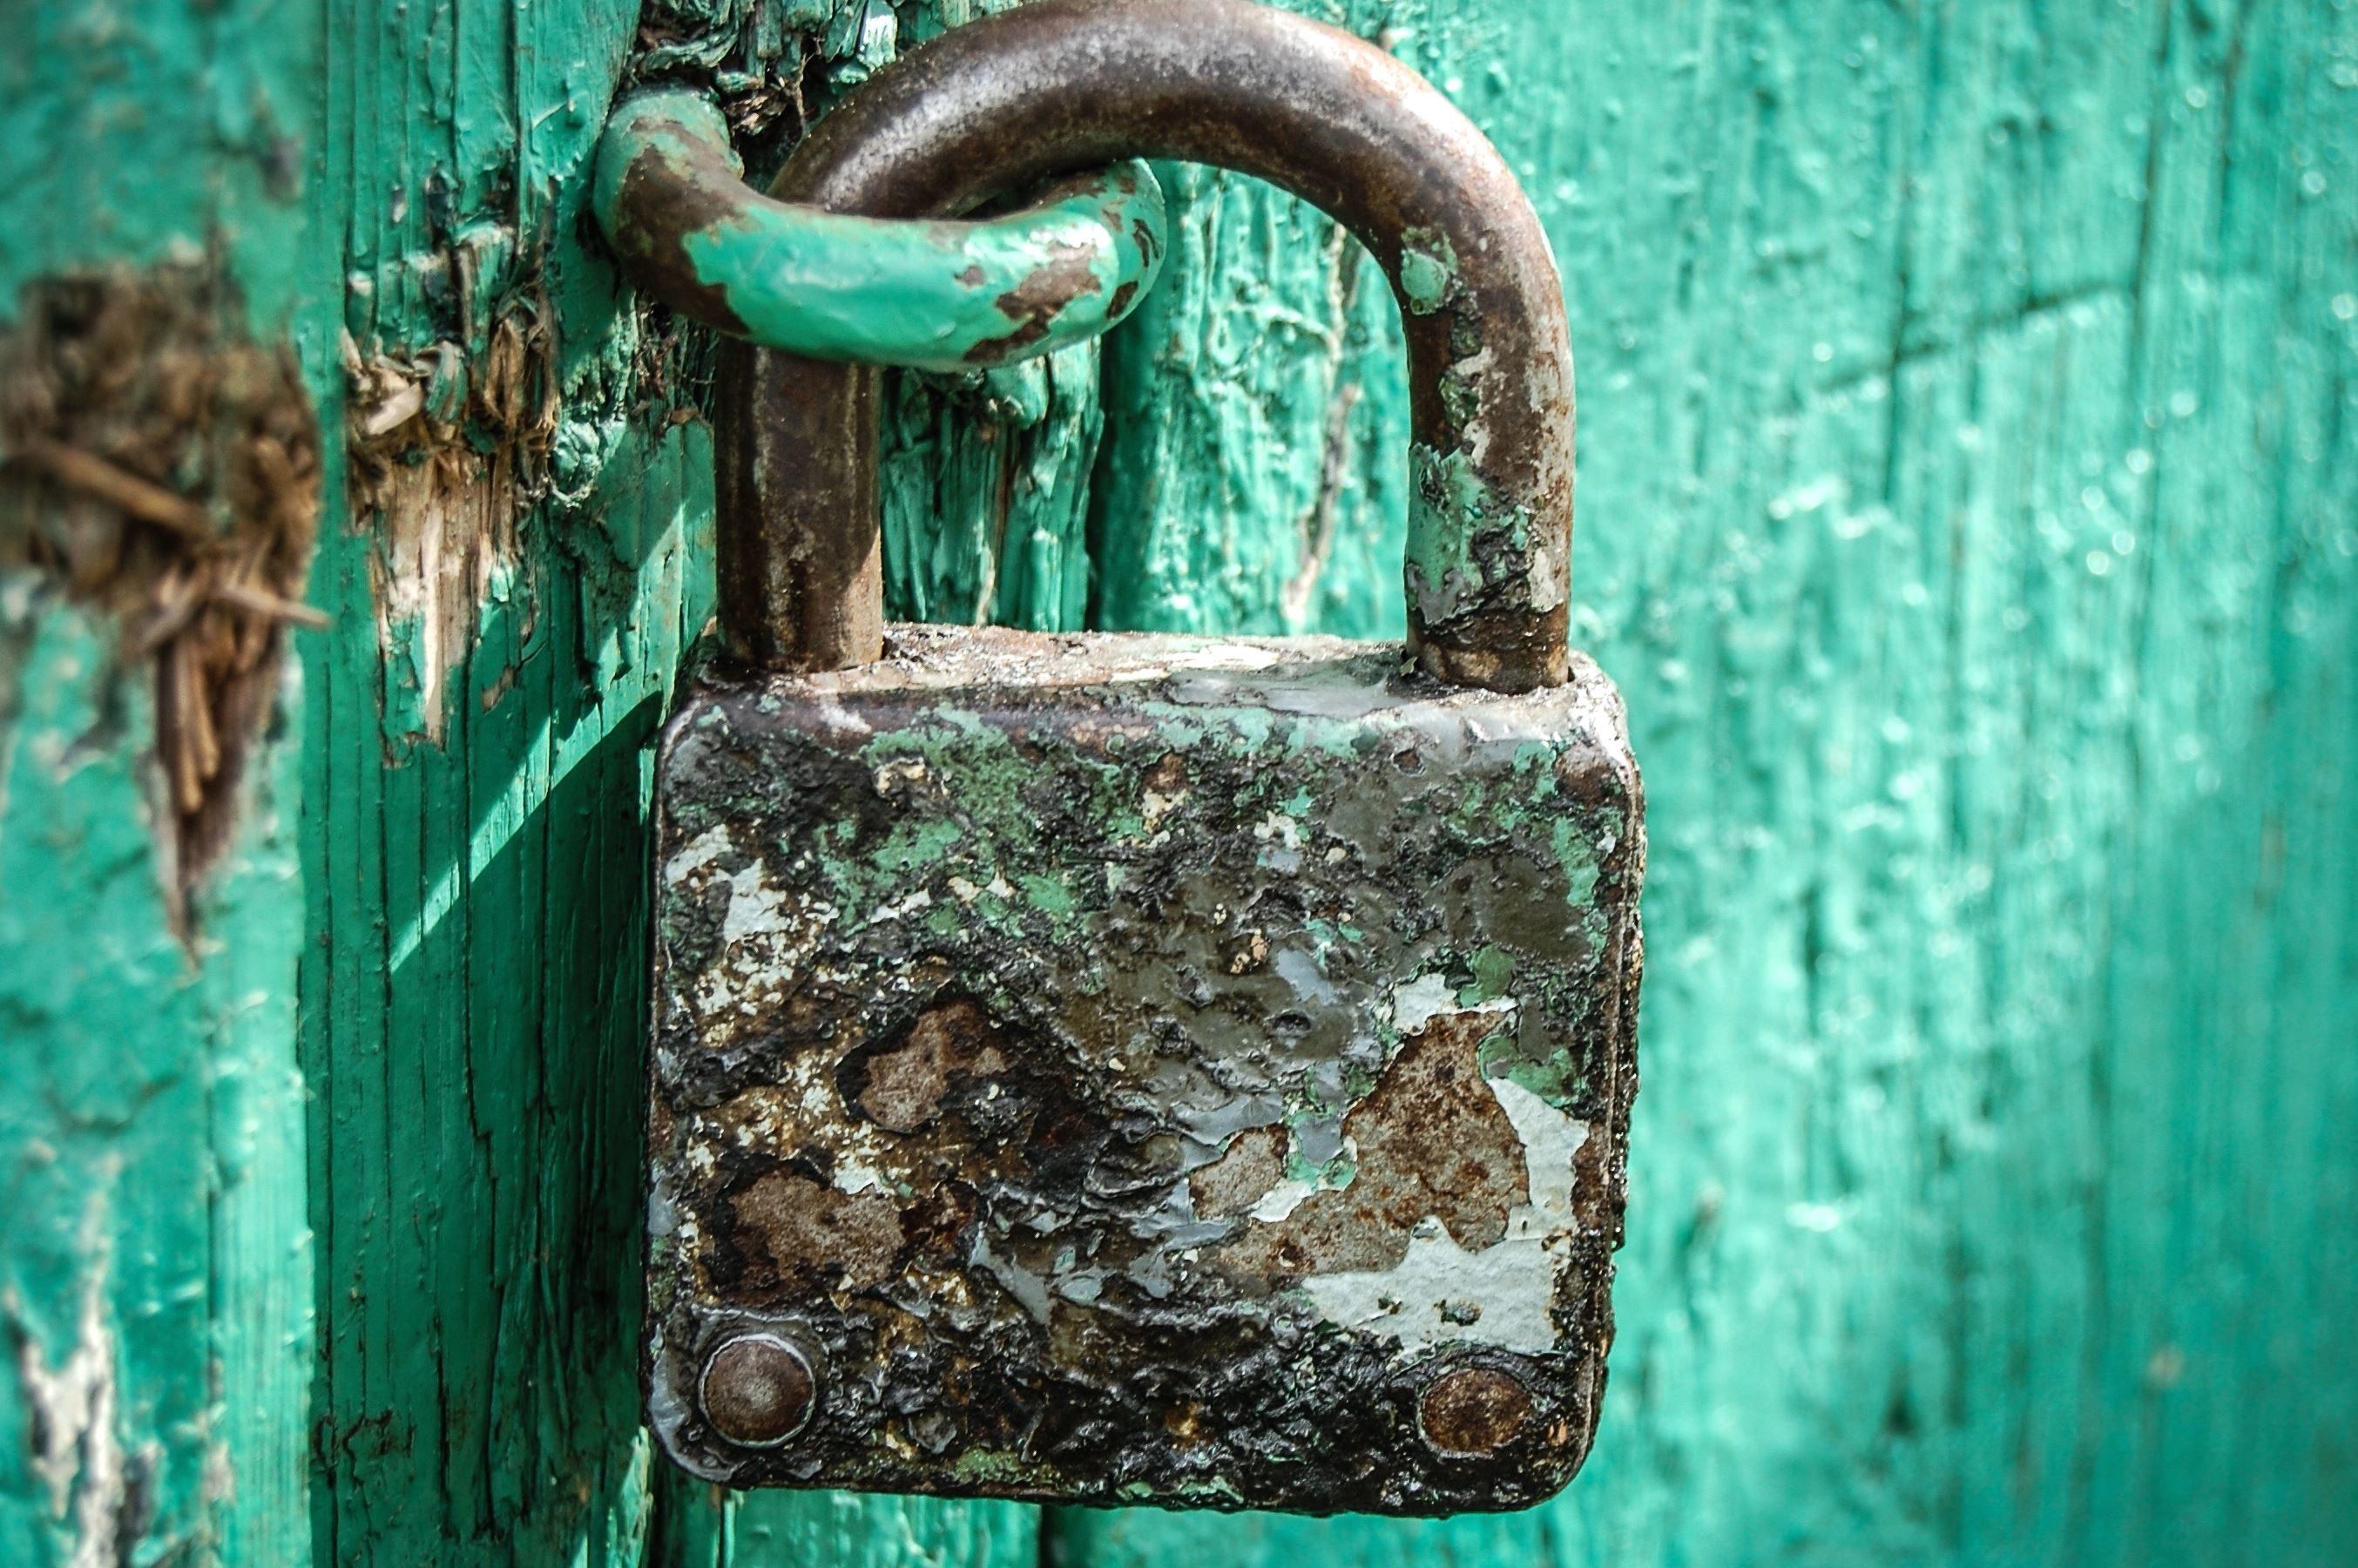 Free picture: padlock, lock, device, rusty, metal, doors, wood